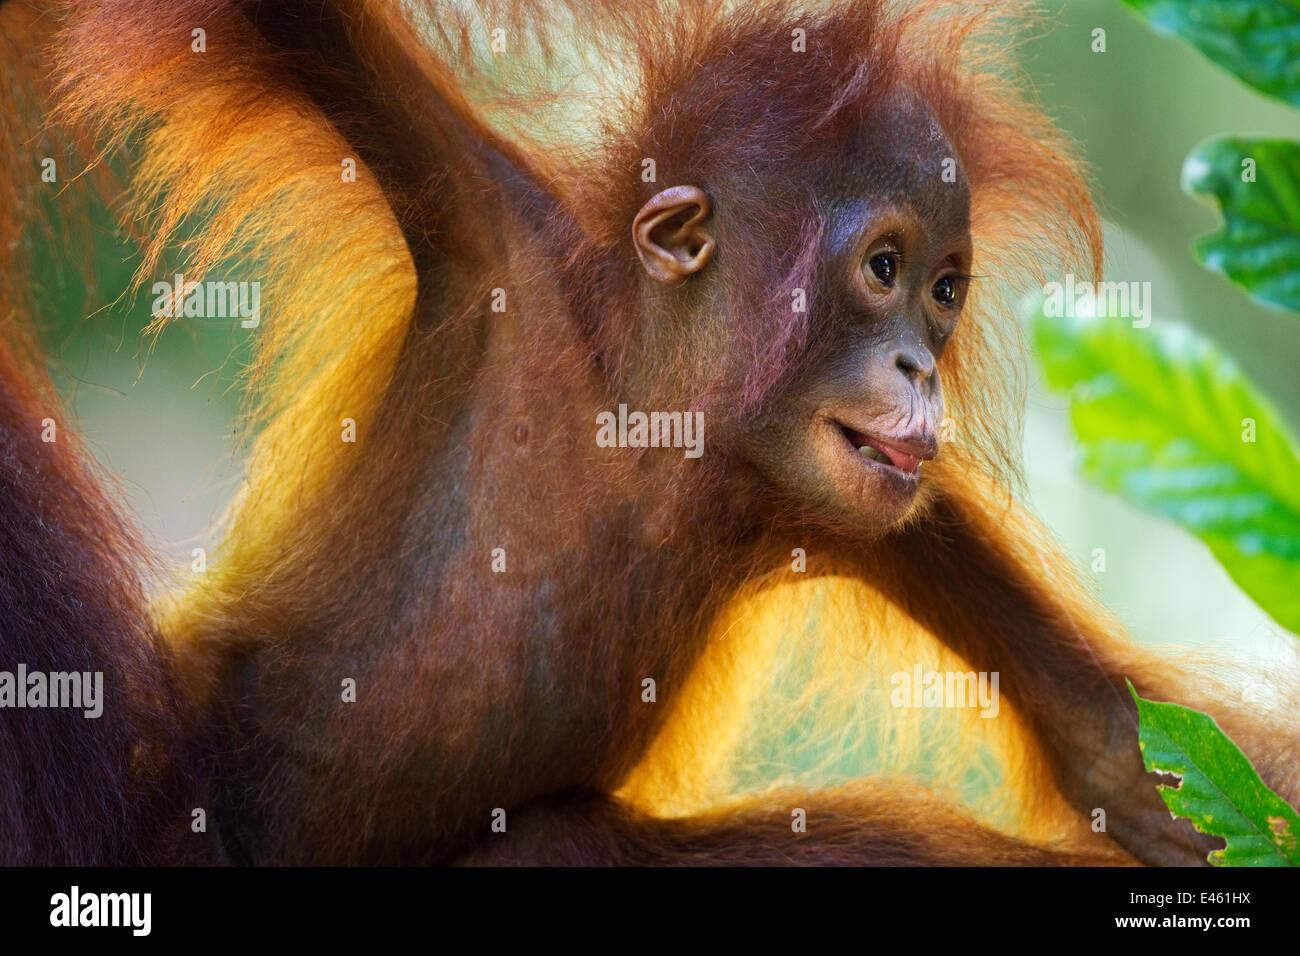 Bornean Orang-utan (Pongo pygmaeus wurmbii) female baby 'Petra' aged 12 months portrait. Camp Leakey, Tanjung - Stock Image